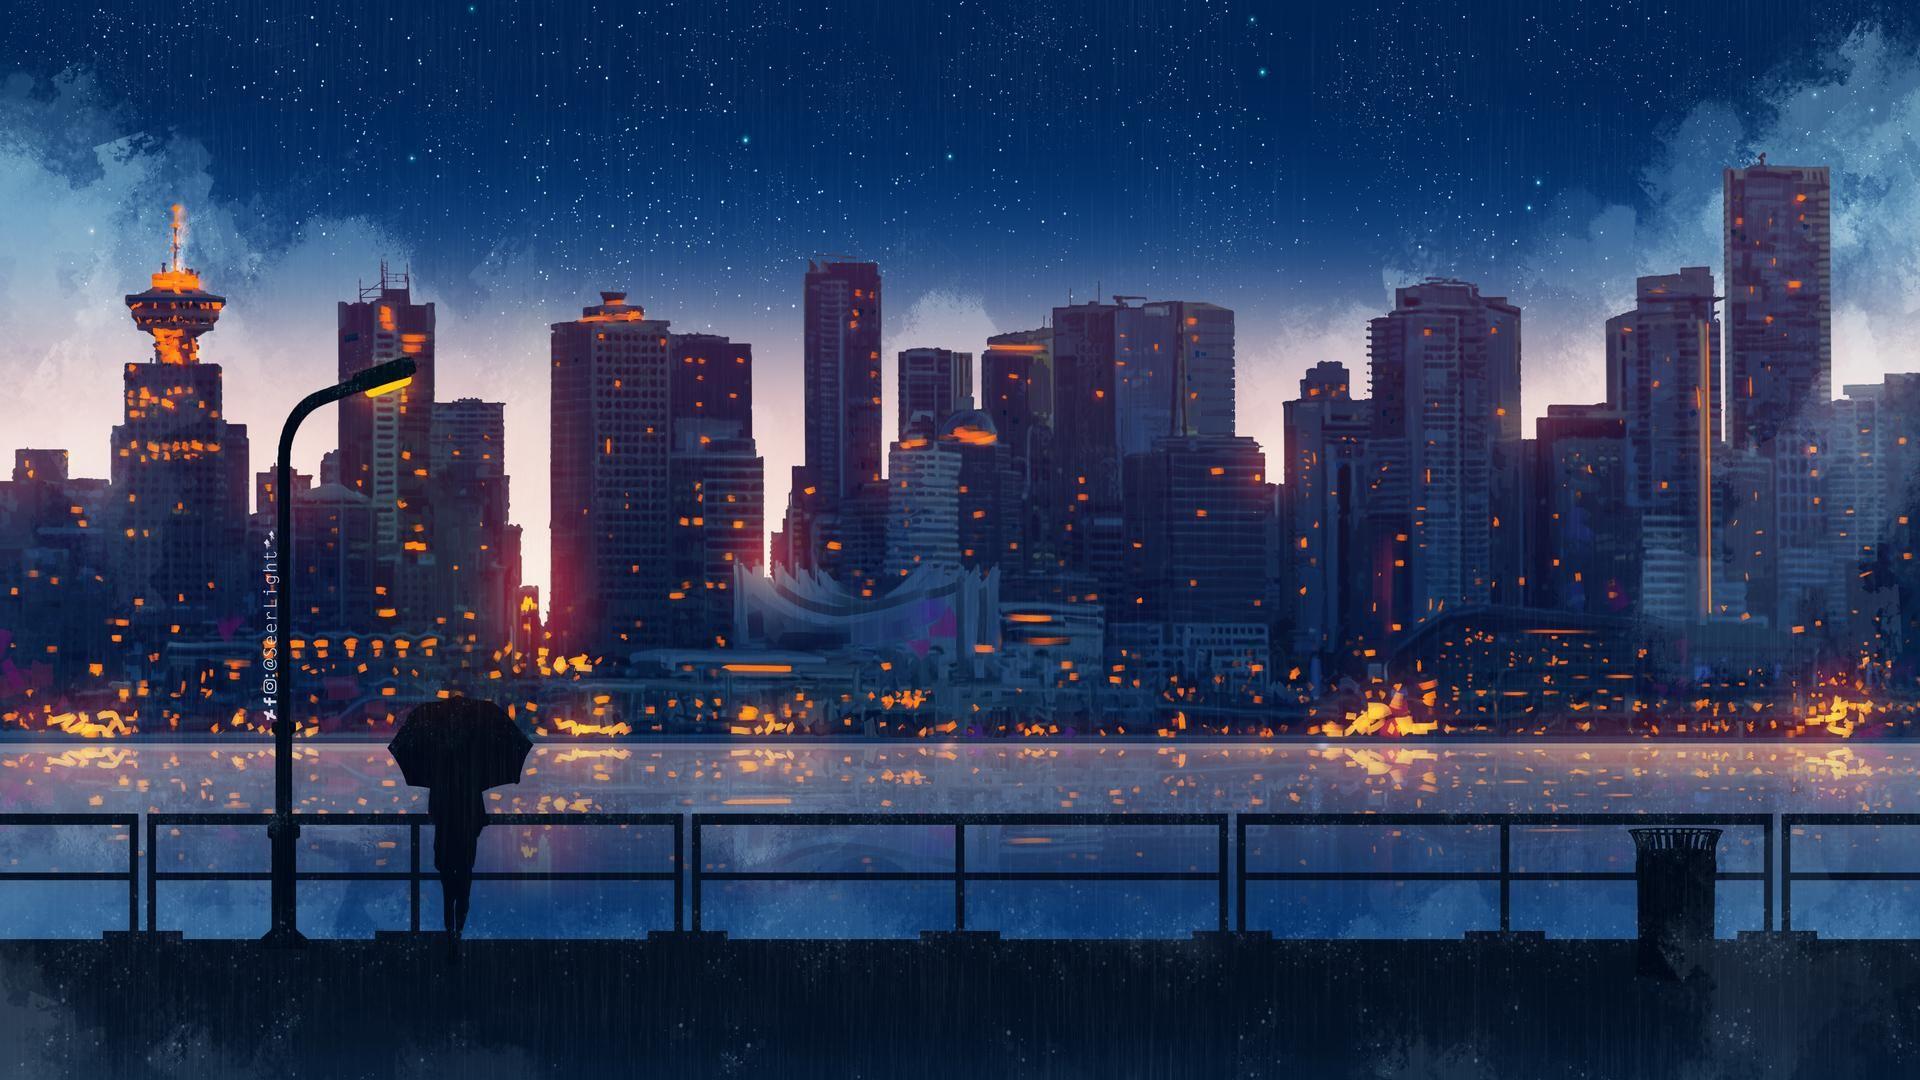 A Rainy Night 1920x1080 Anime City Night Scenery Anime Scenery Wallpaper